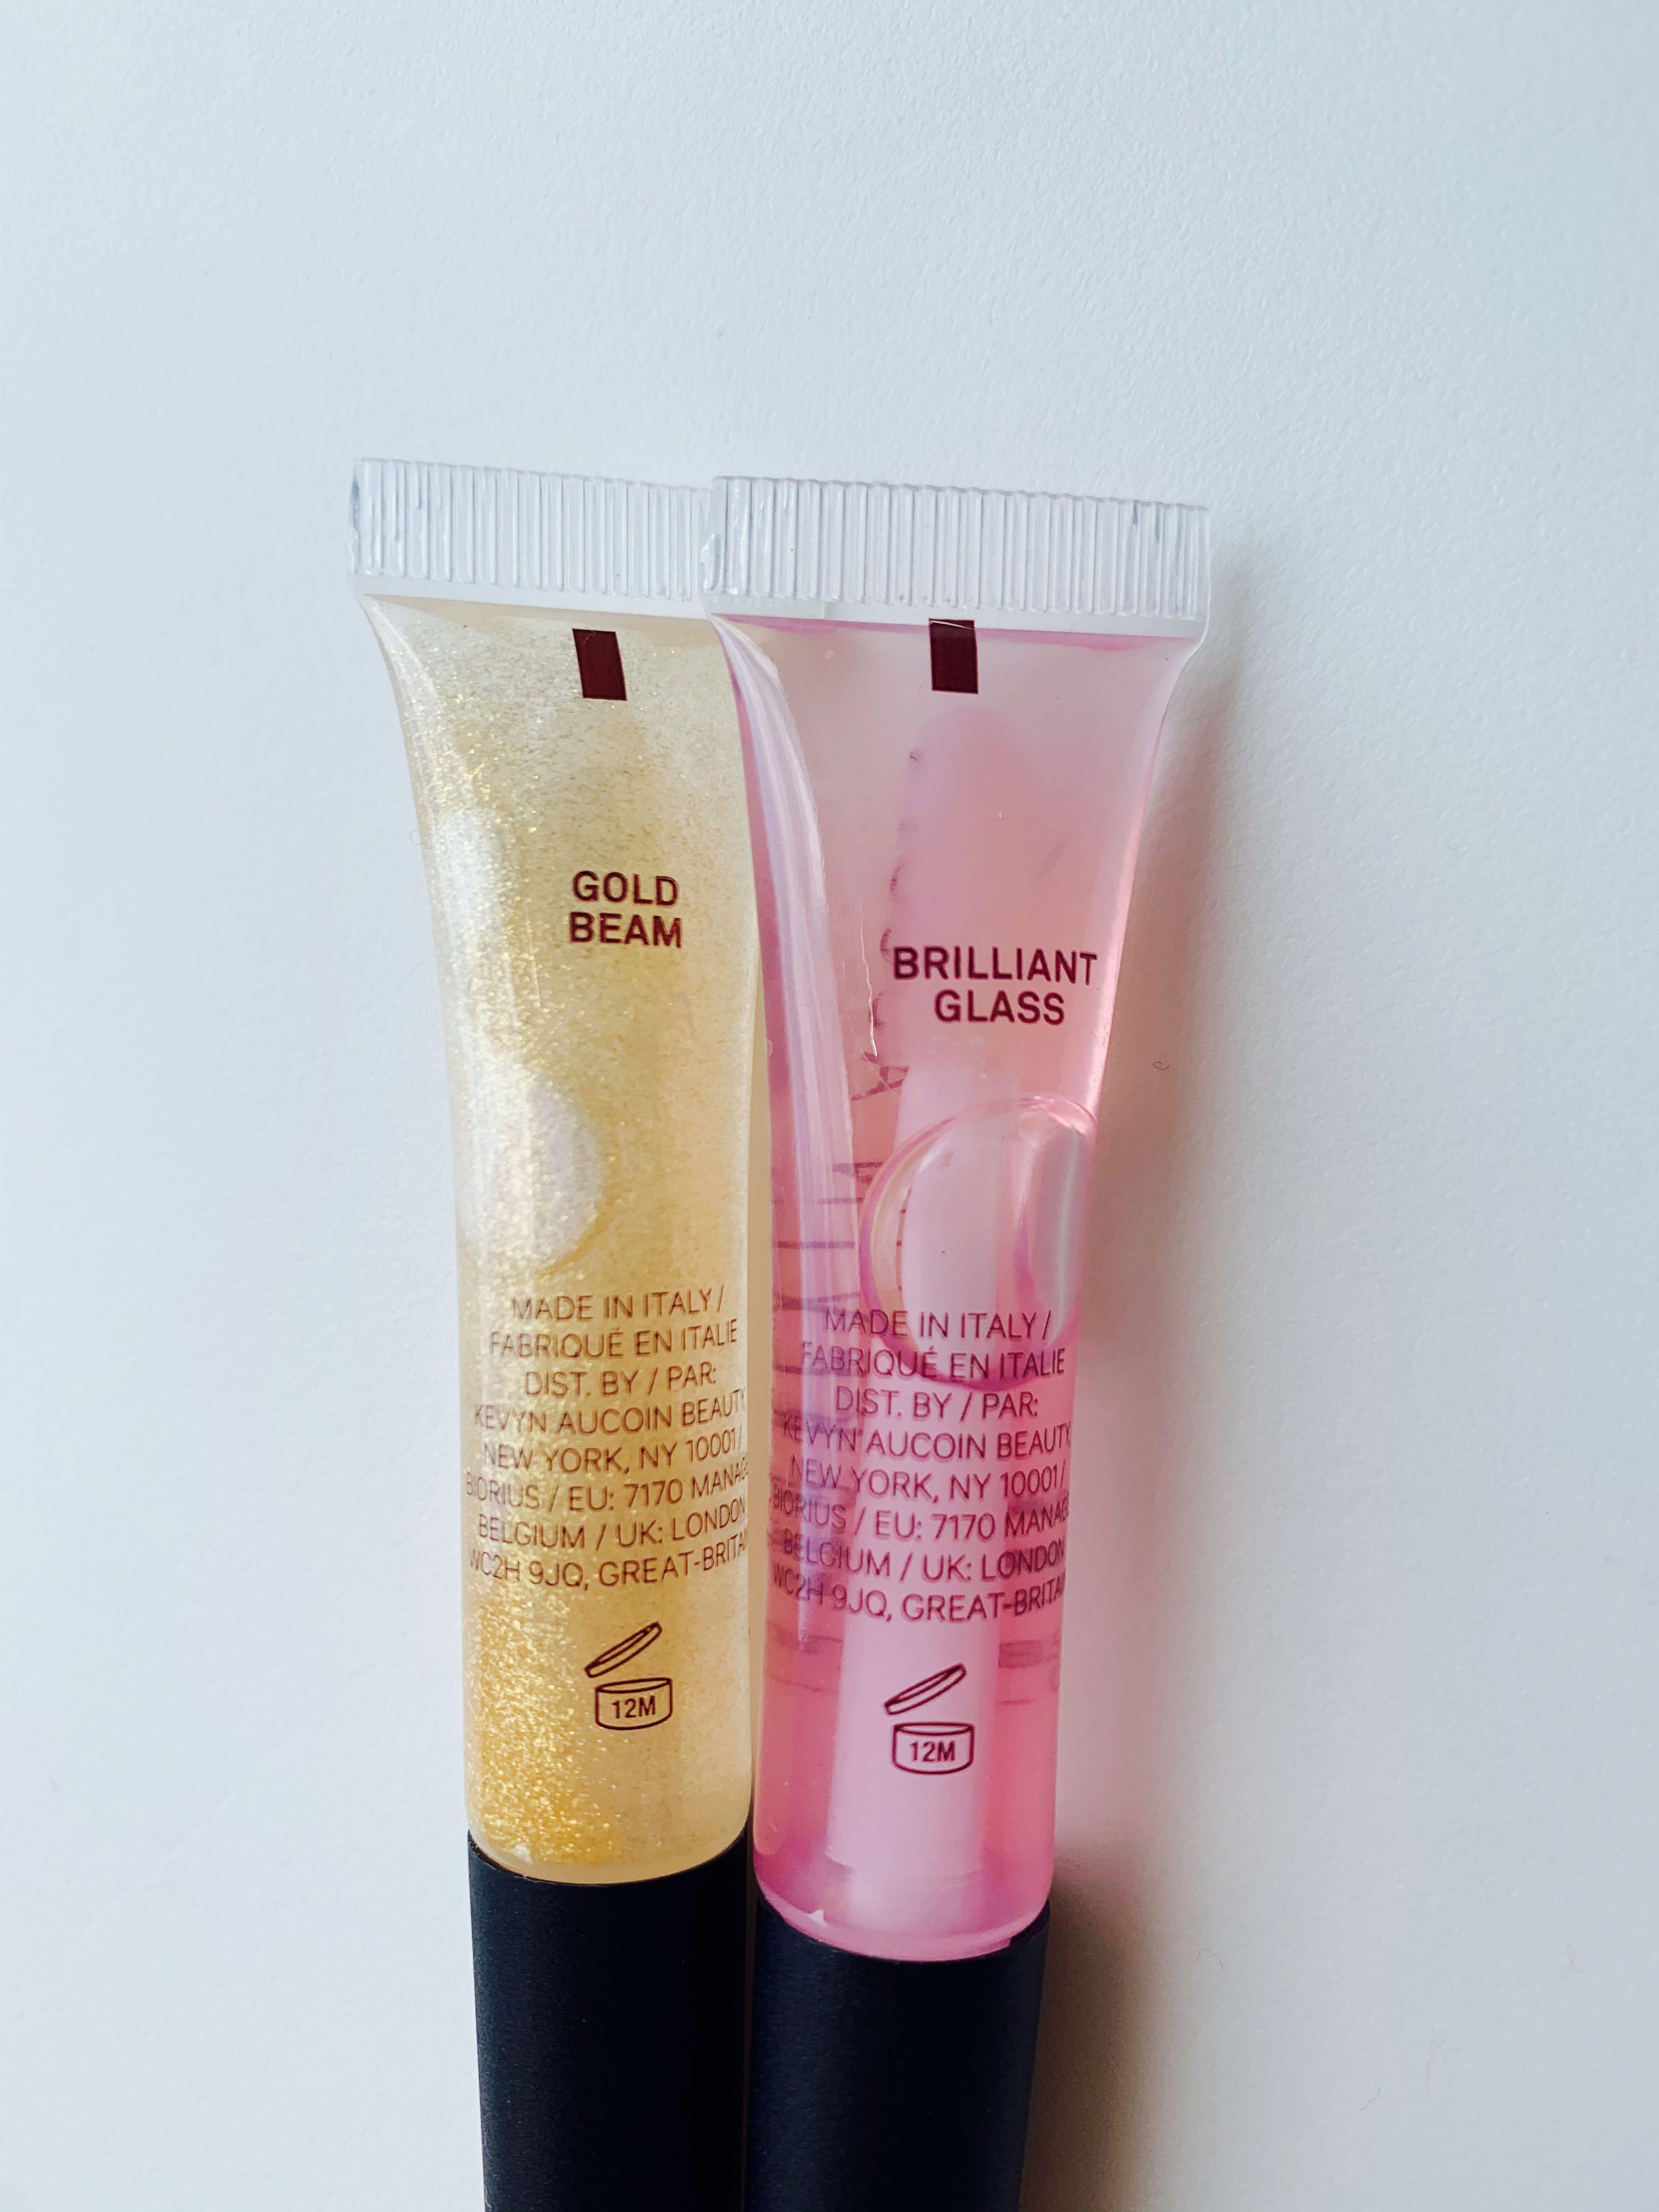 Kevyn Aucoin Glass Glow Lip Gloss in Gold Beam/Brilliant Glass